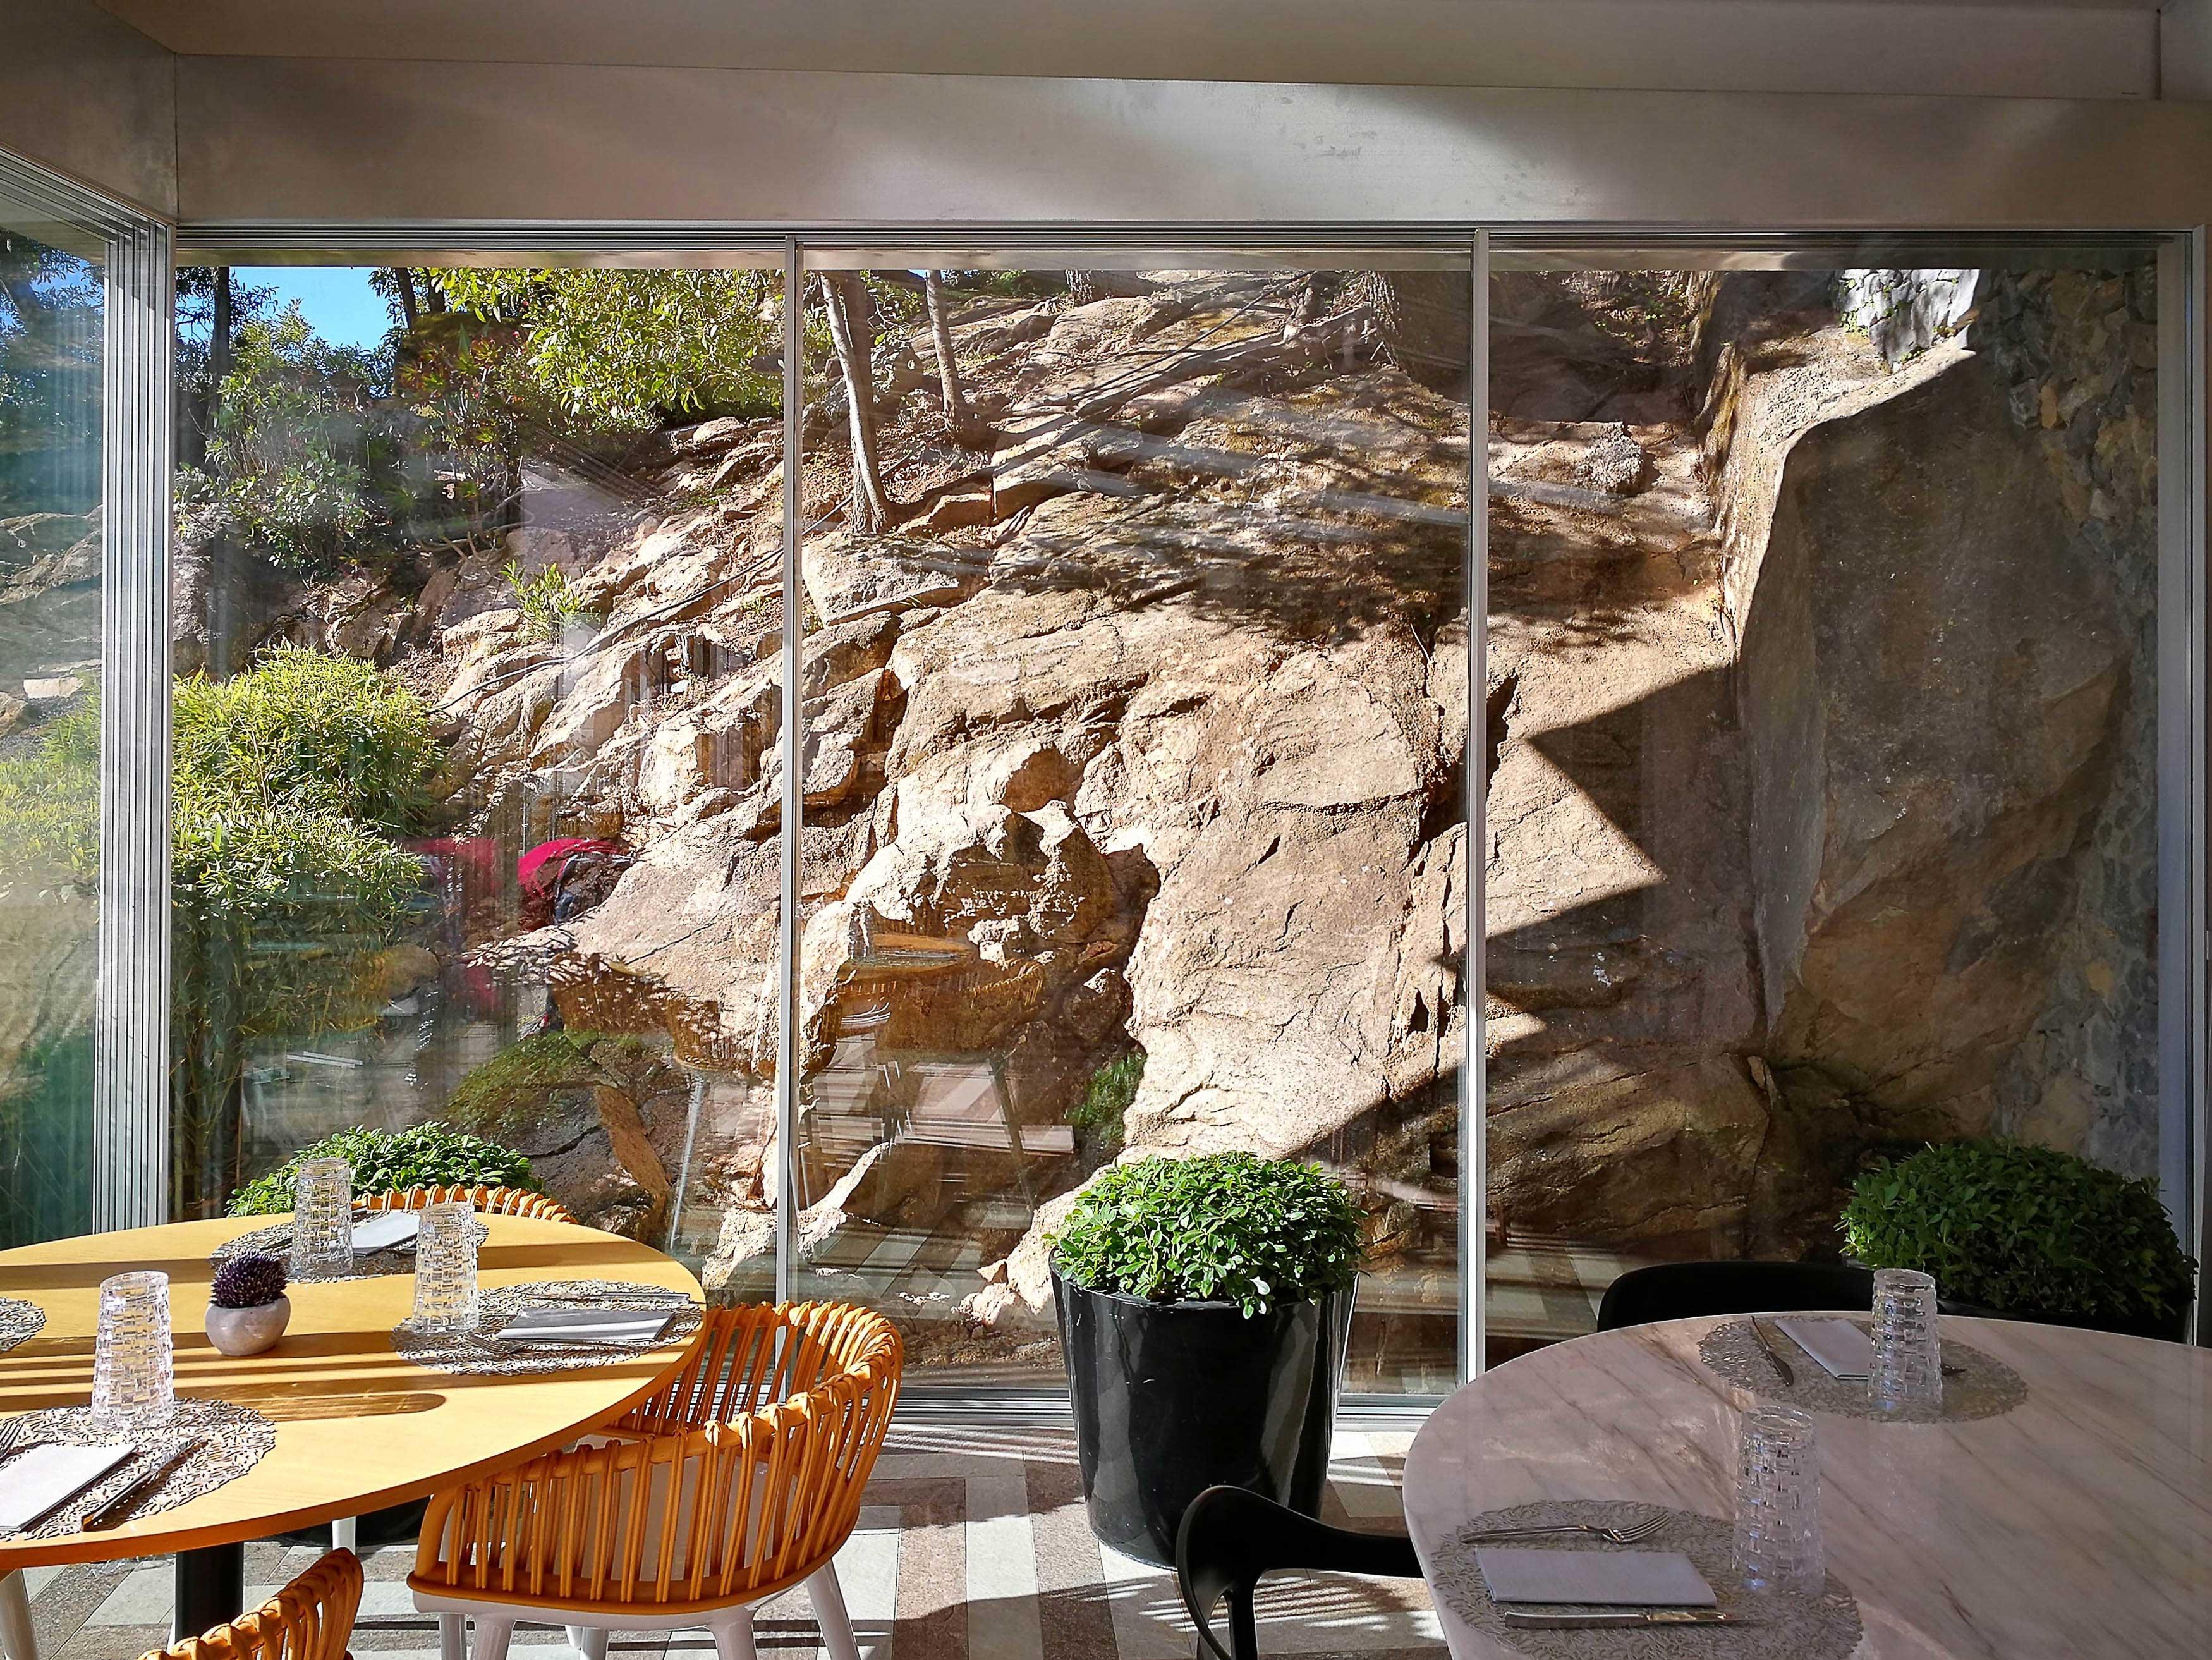 ventanaminimalista_creawindows_minimalist-window_minimal-arquitecture28